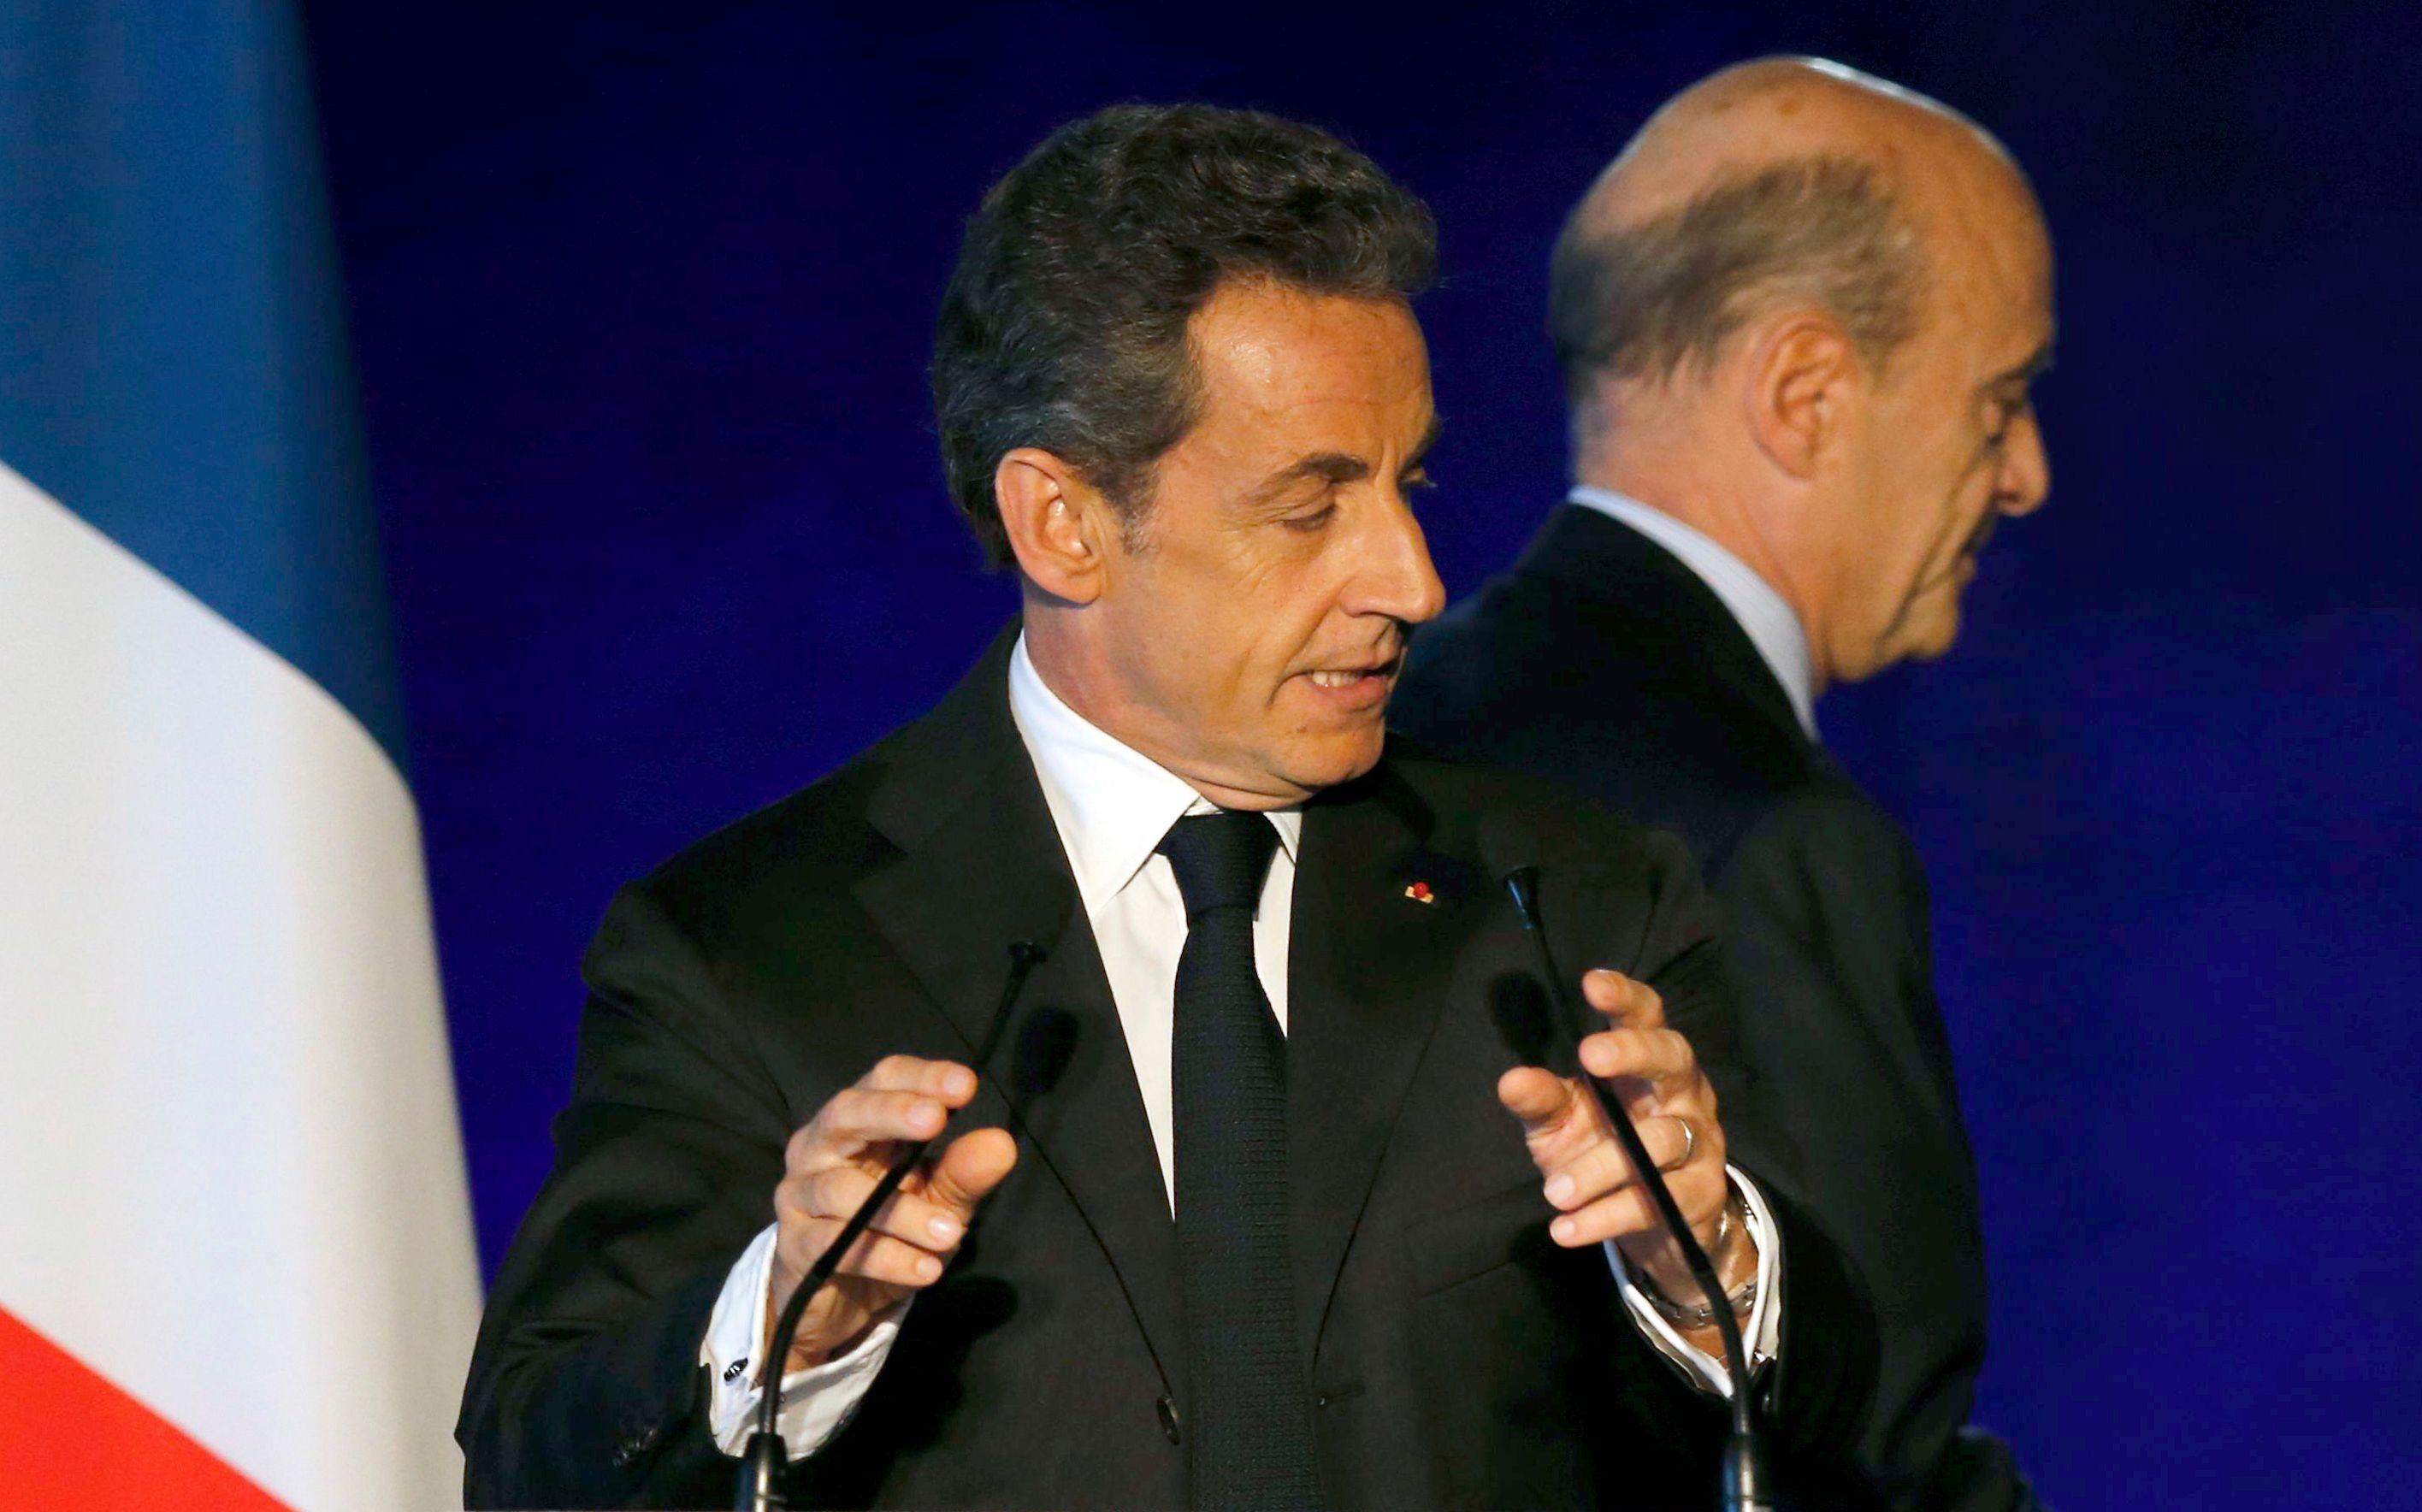 """Ce n'est pas du tout un mea culpa"" clame Nicolas Sarkozy"